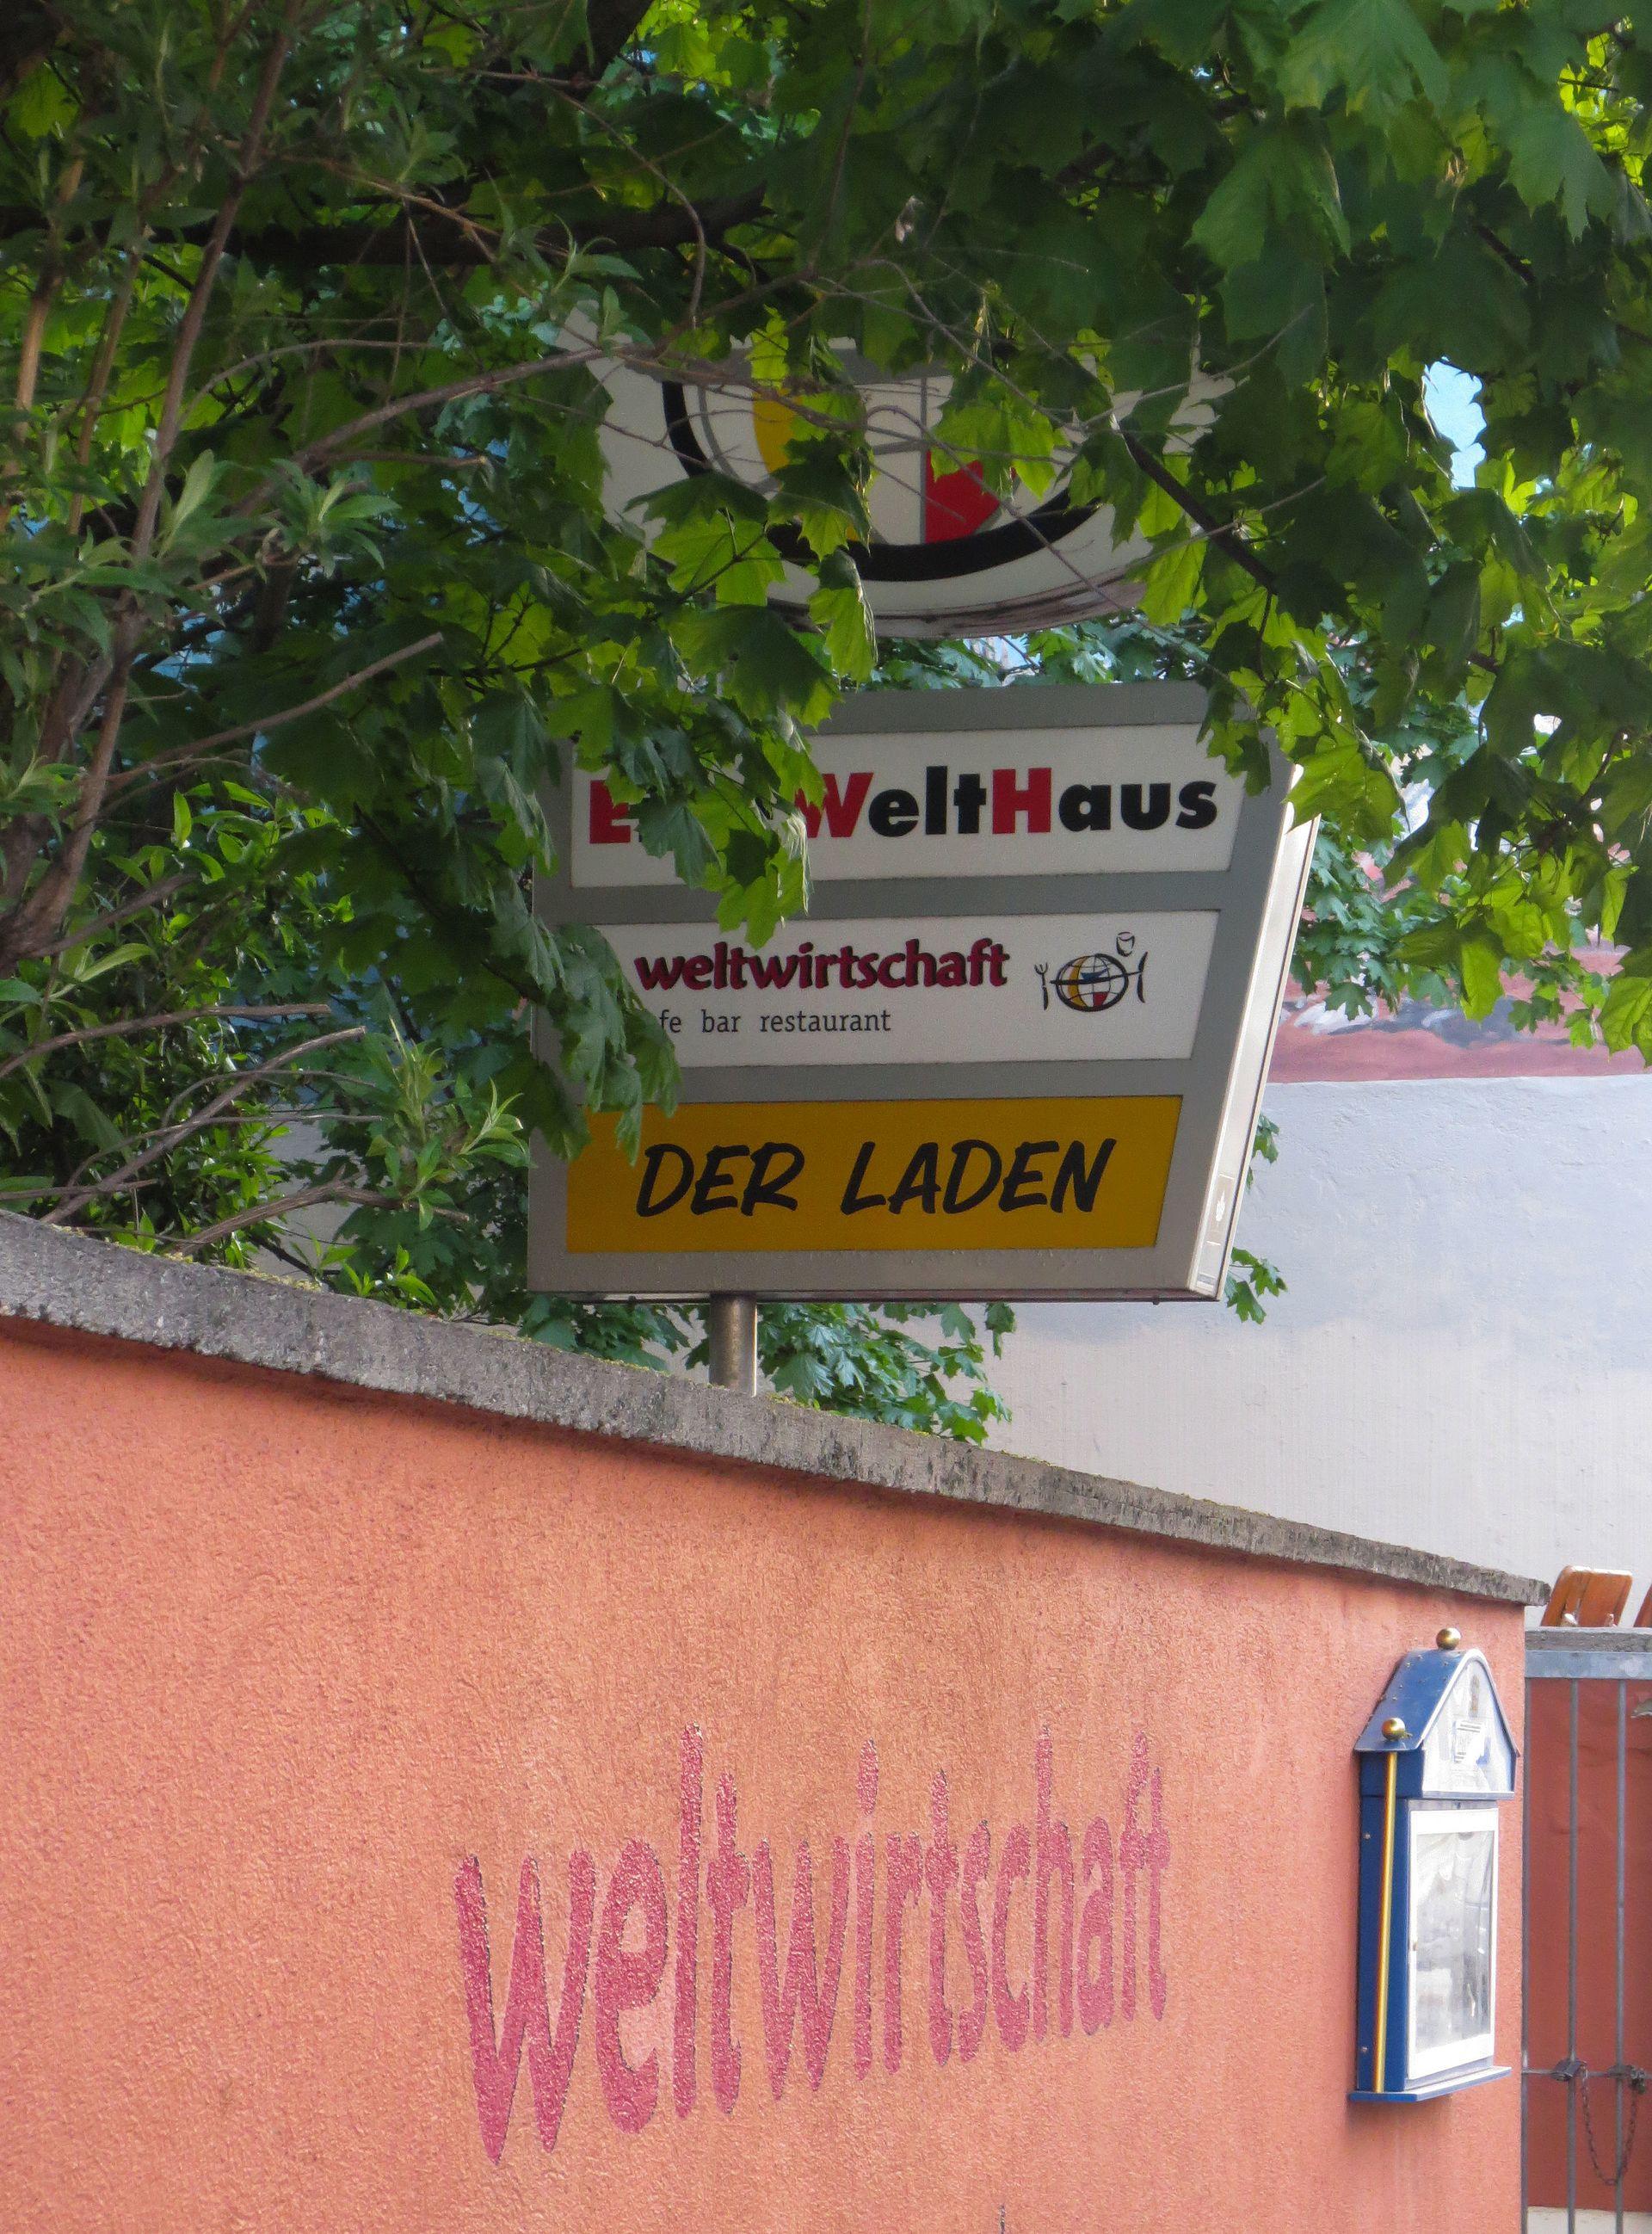 Eine Welt Haus München  Eine Welt Haus München –